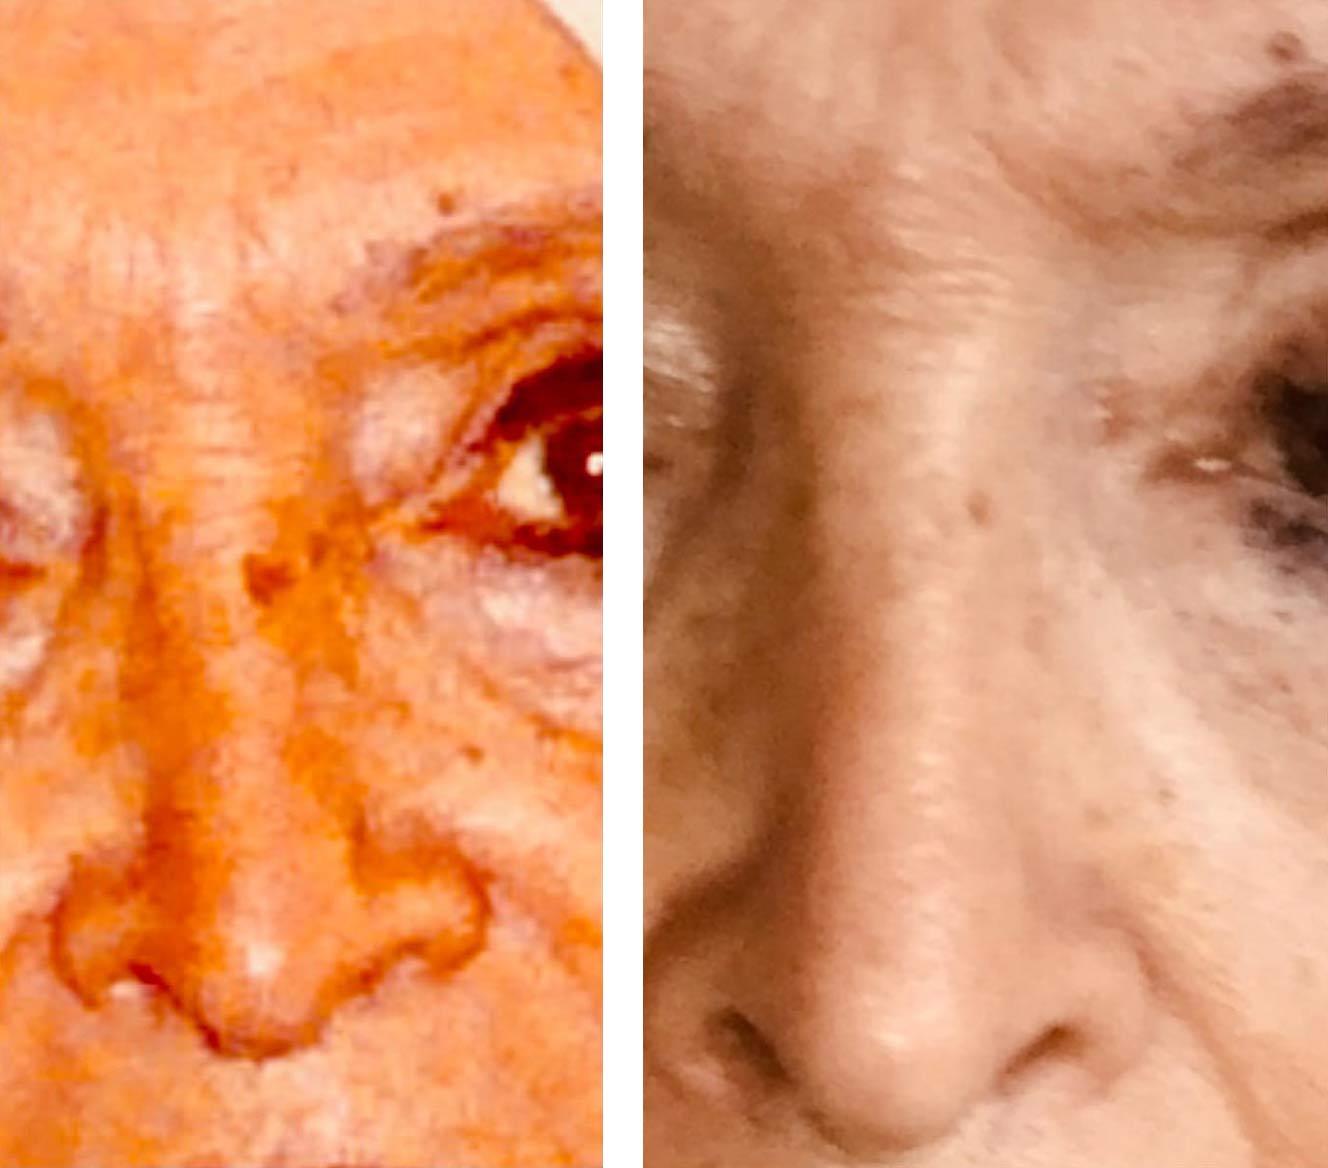 avant-apres-phototherapie-photobiomodulation-avis-temoignage-main-taches-brunes-visage-femme